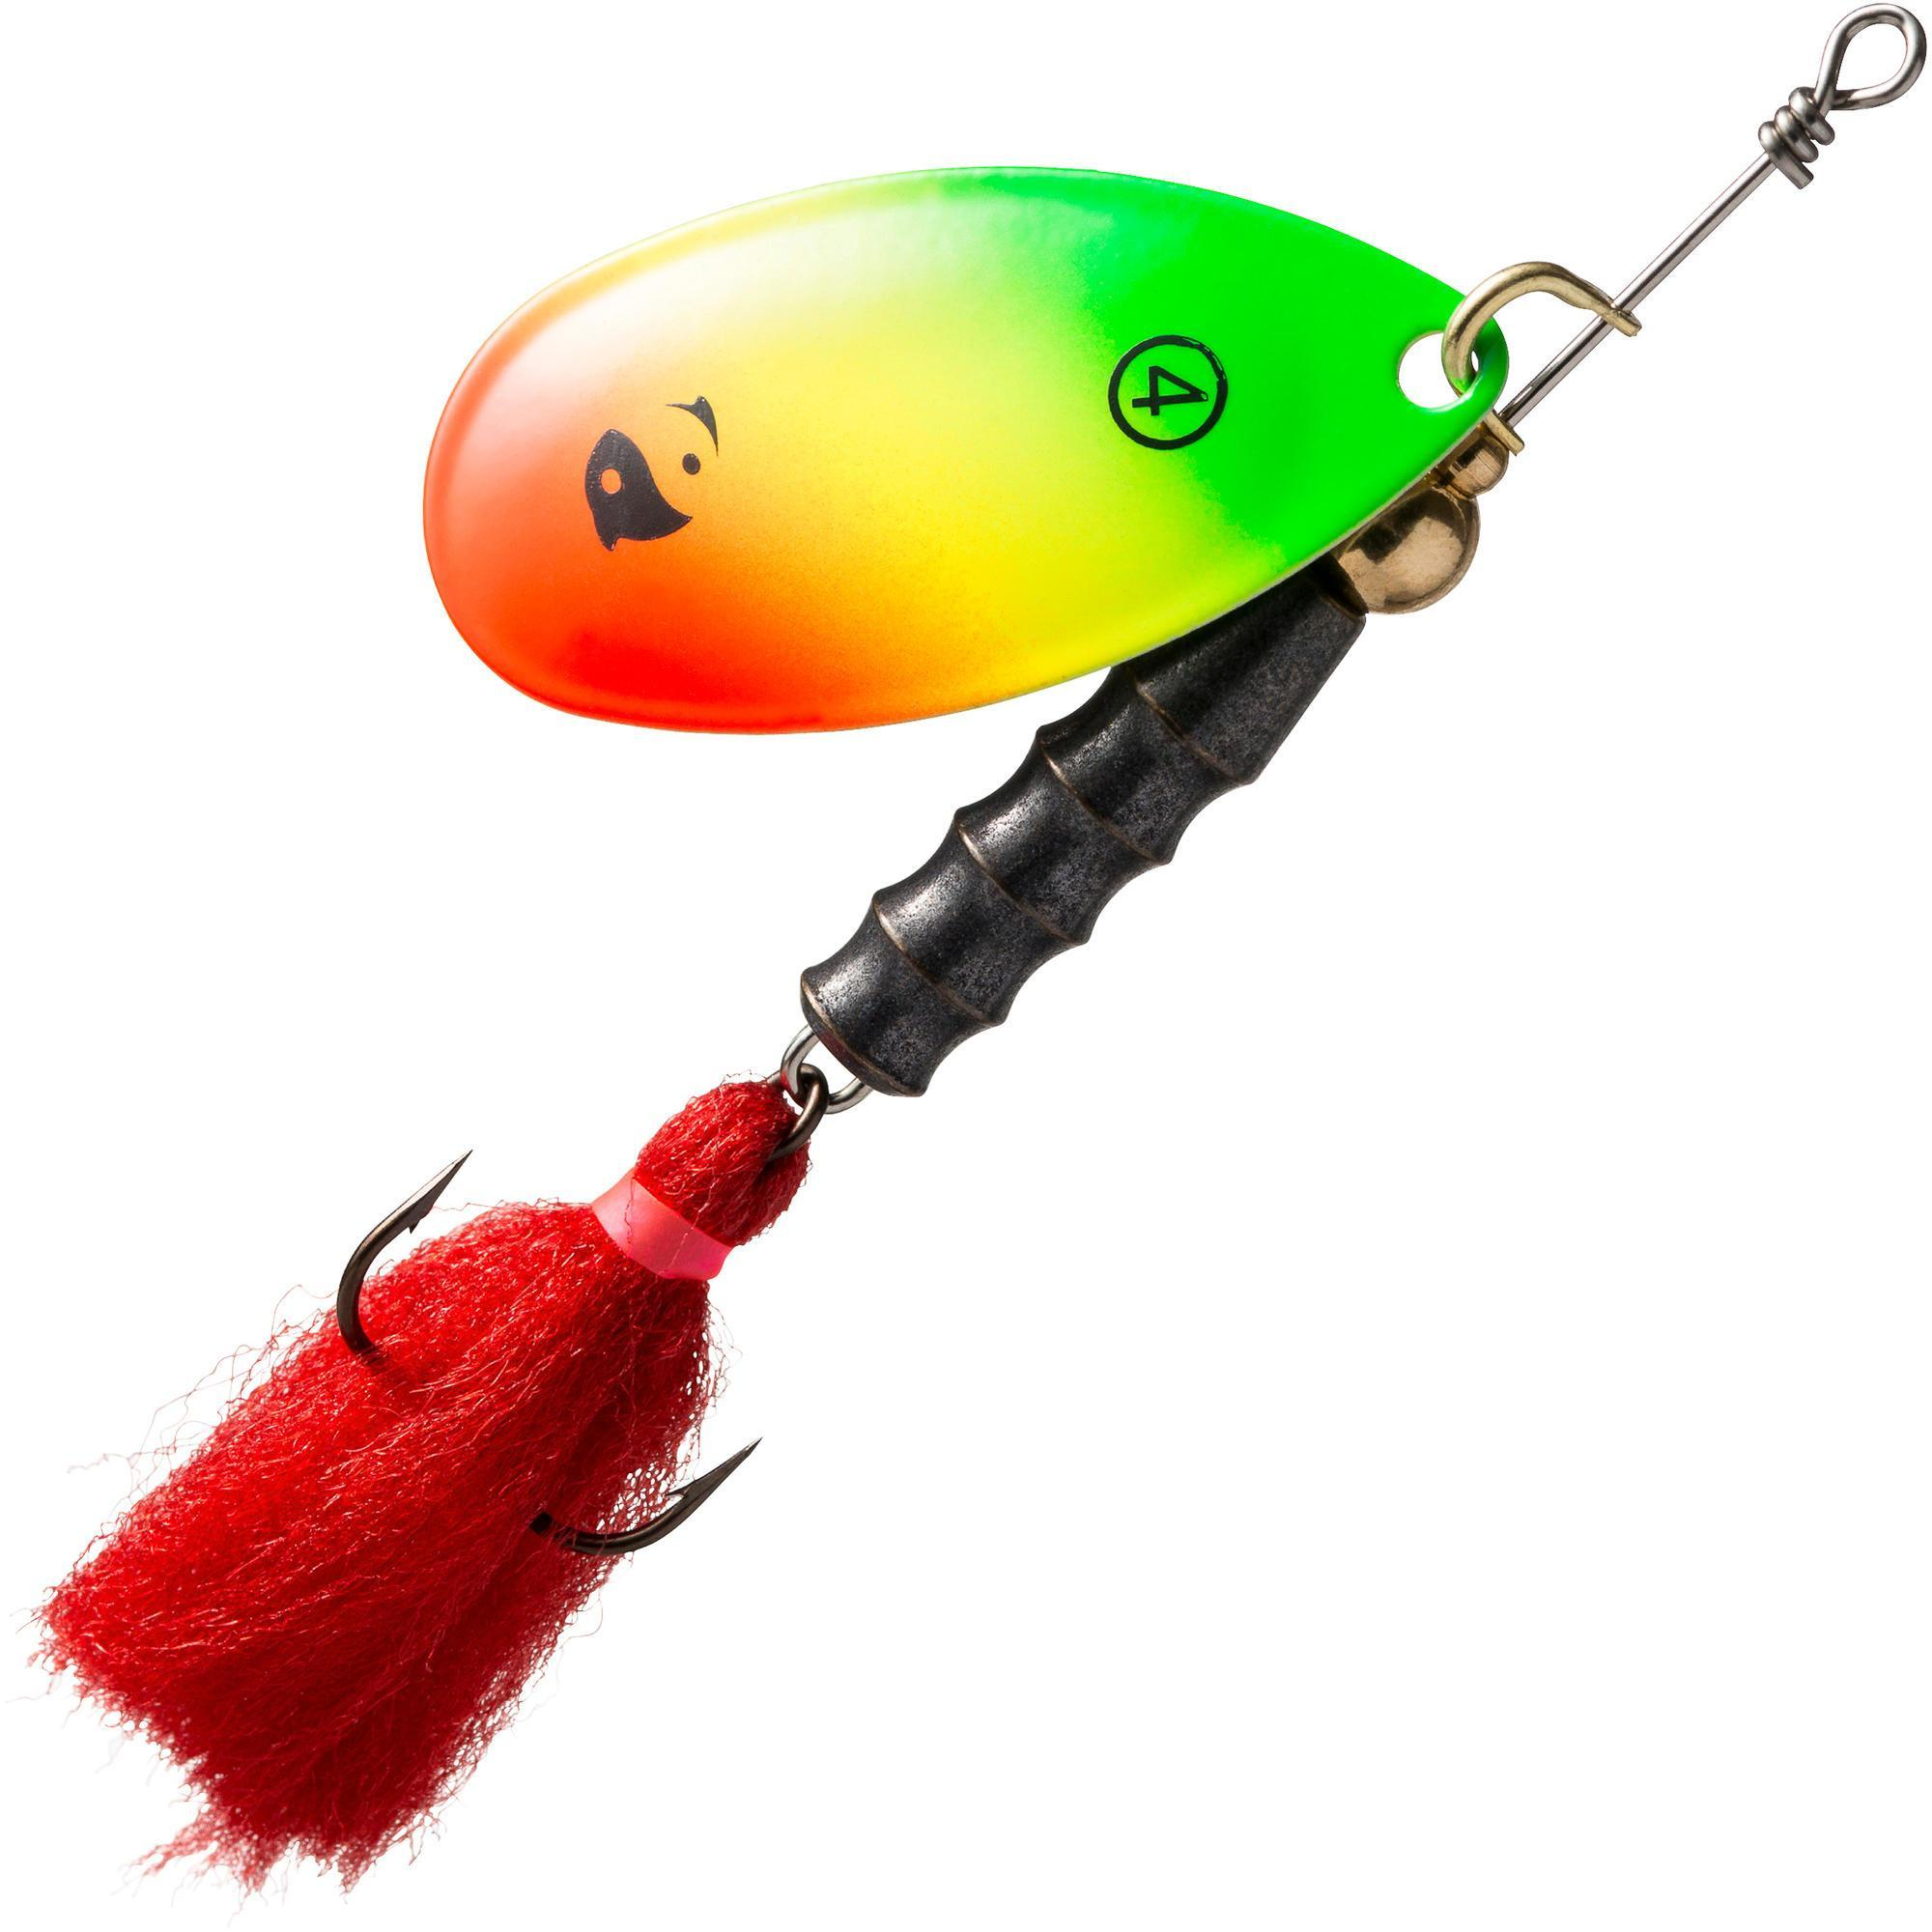 Caperlan Spinner voor roofvissen Weta Puff #4 rasta